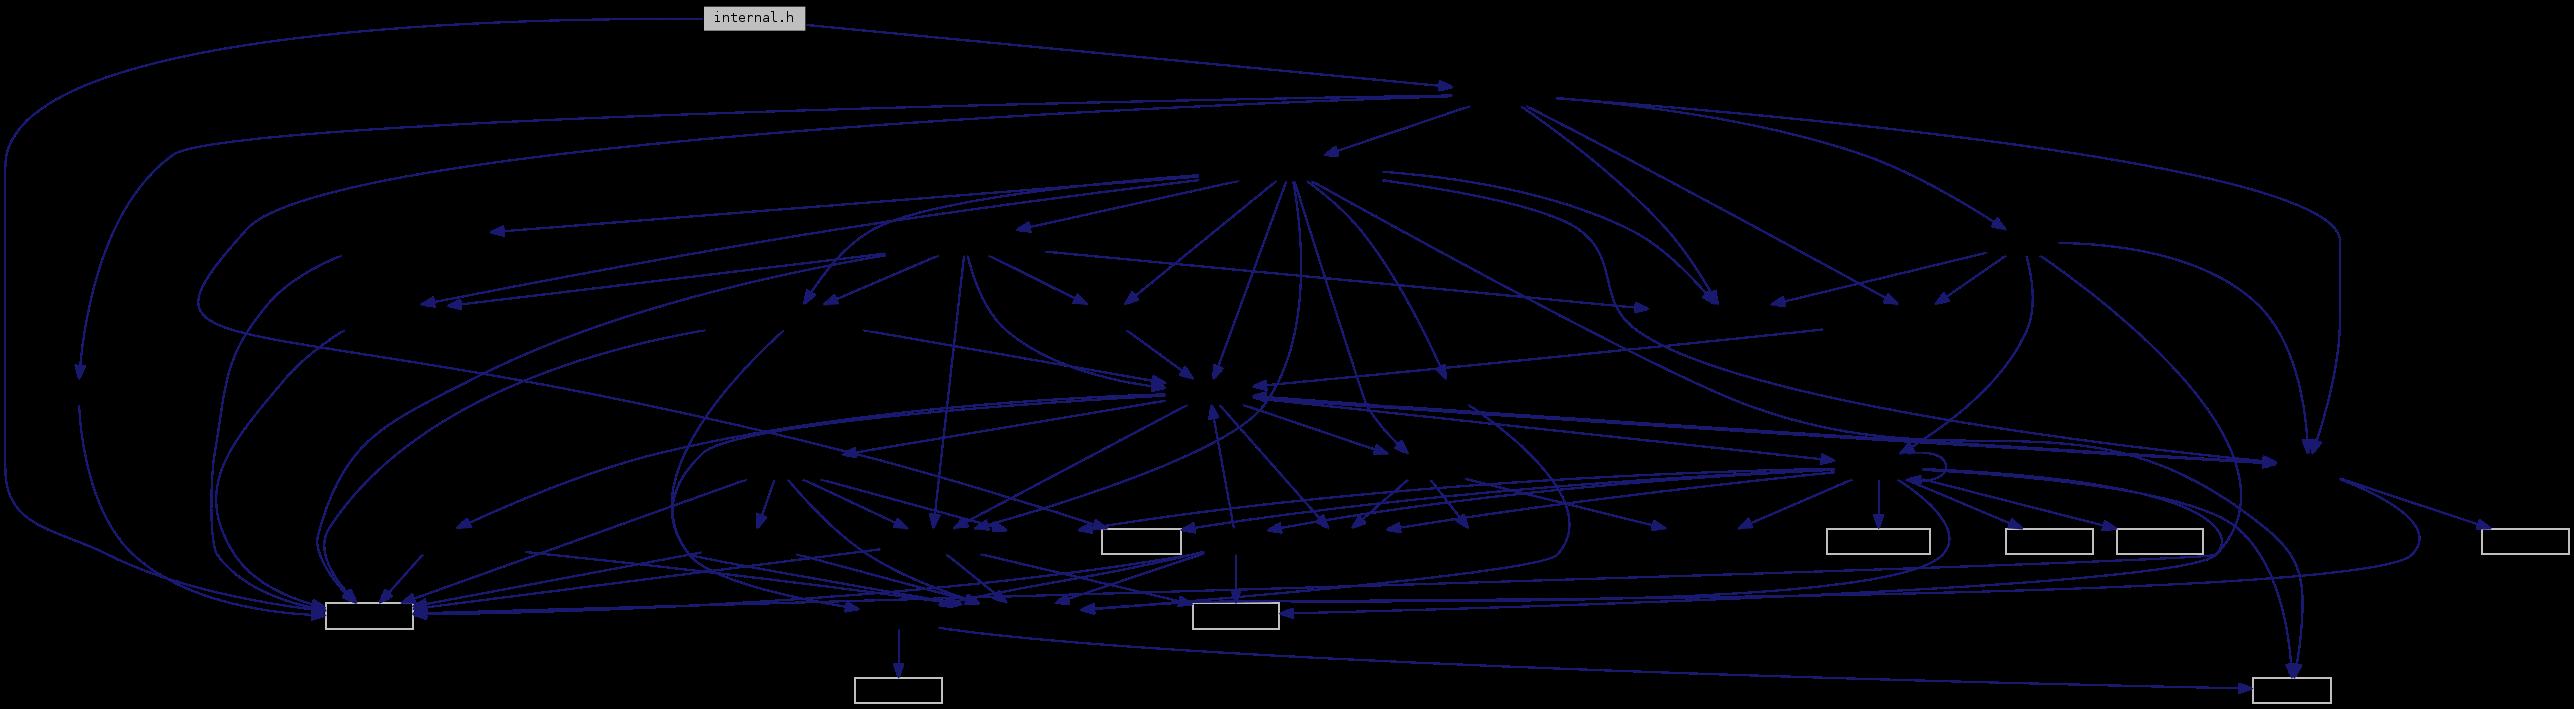 FFmpeg: internal h File Reference - Paris Hackday Code - Sound